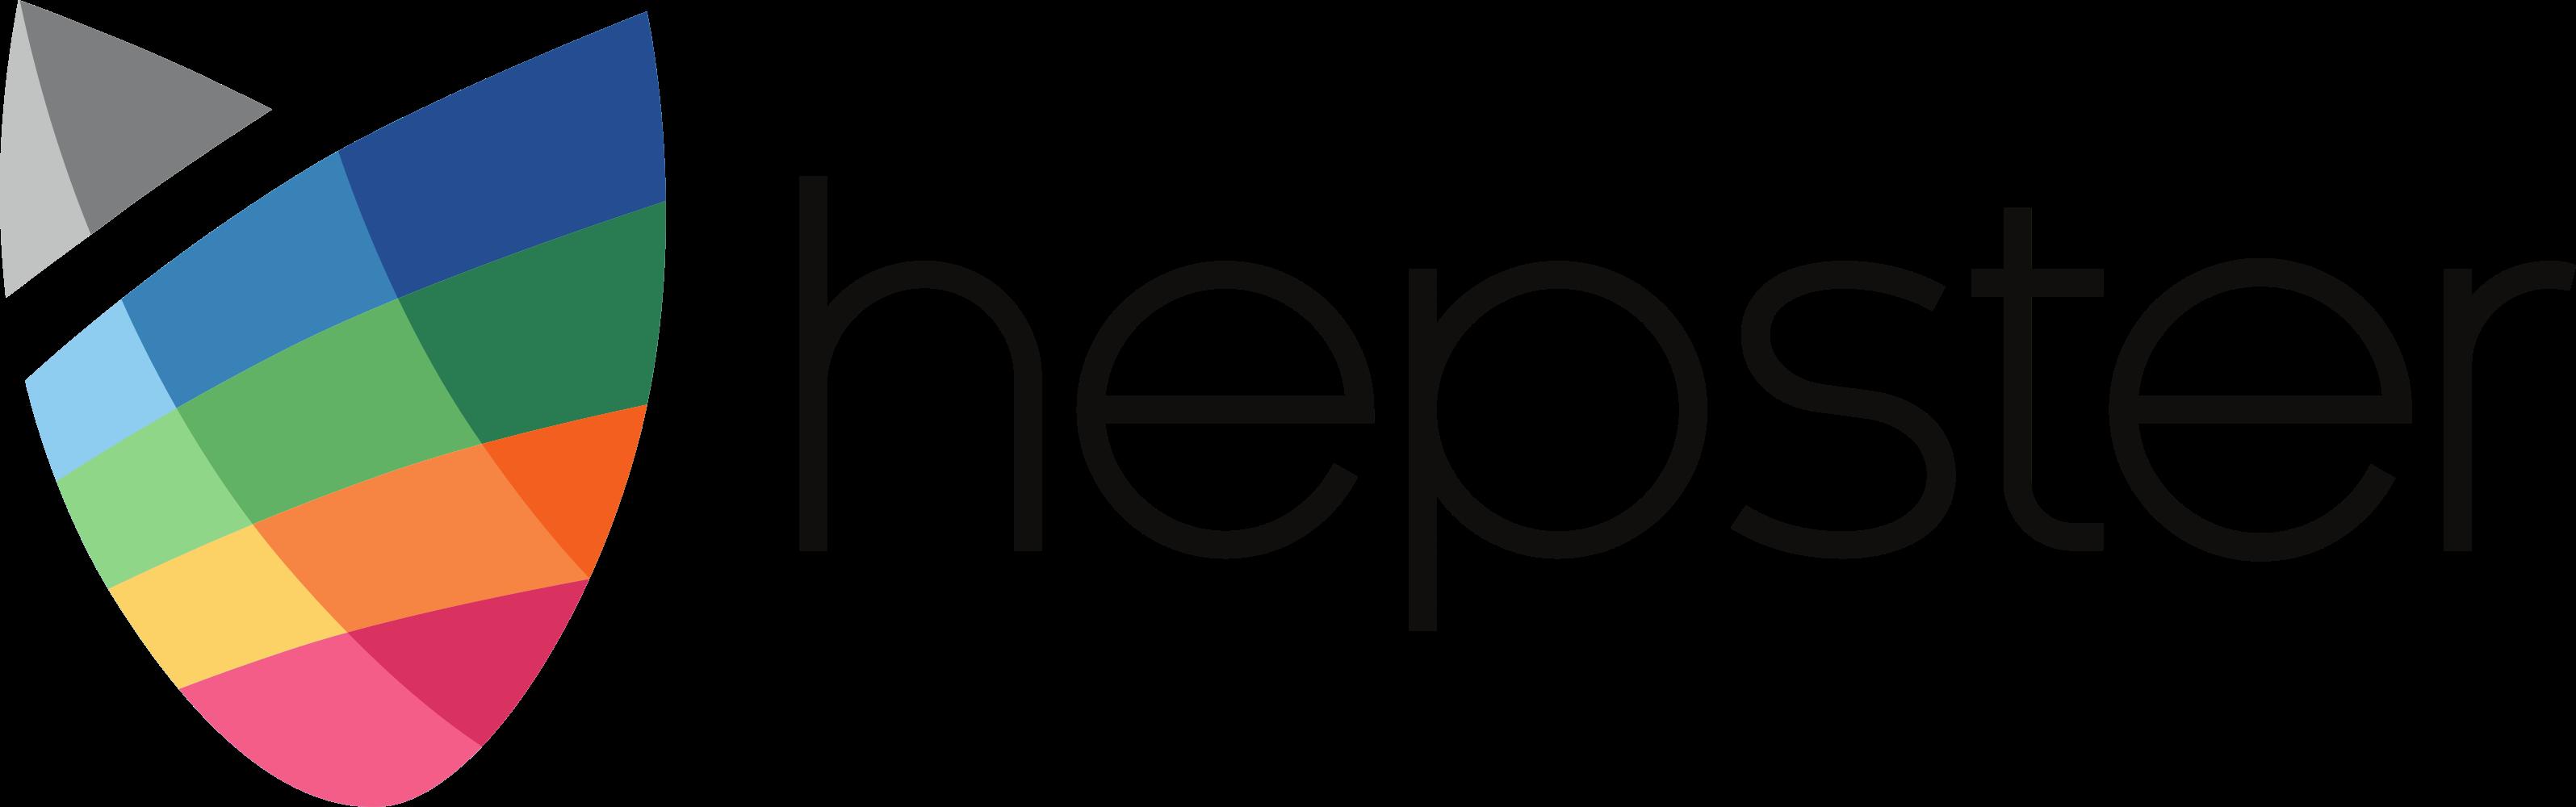 Logo hepster farbig